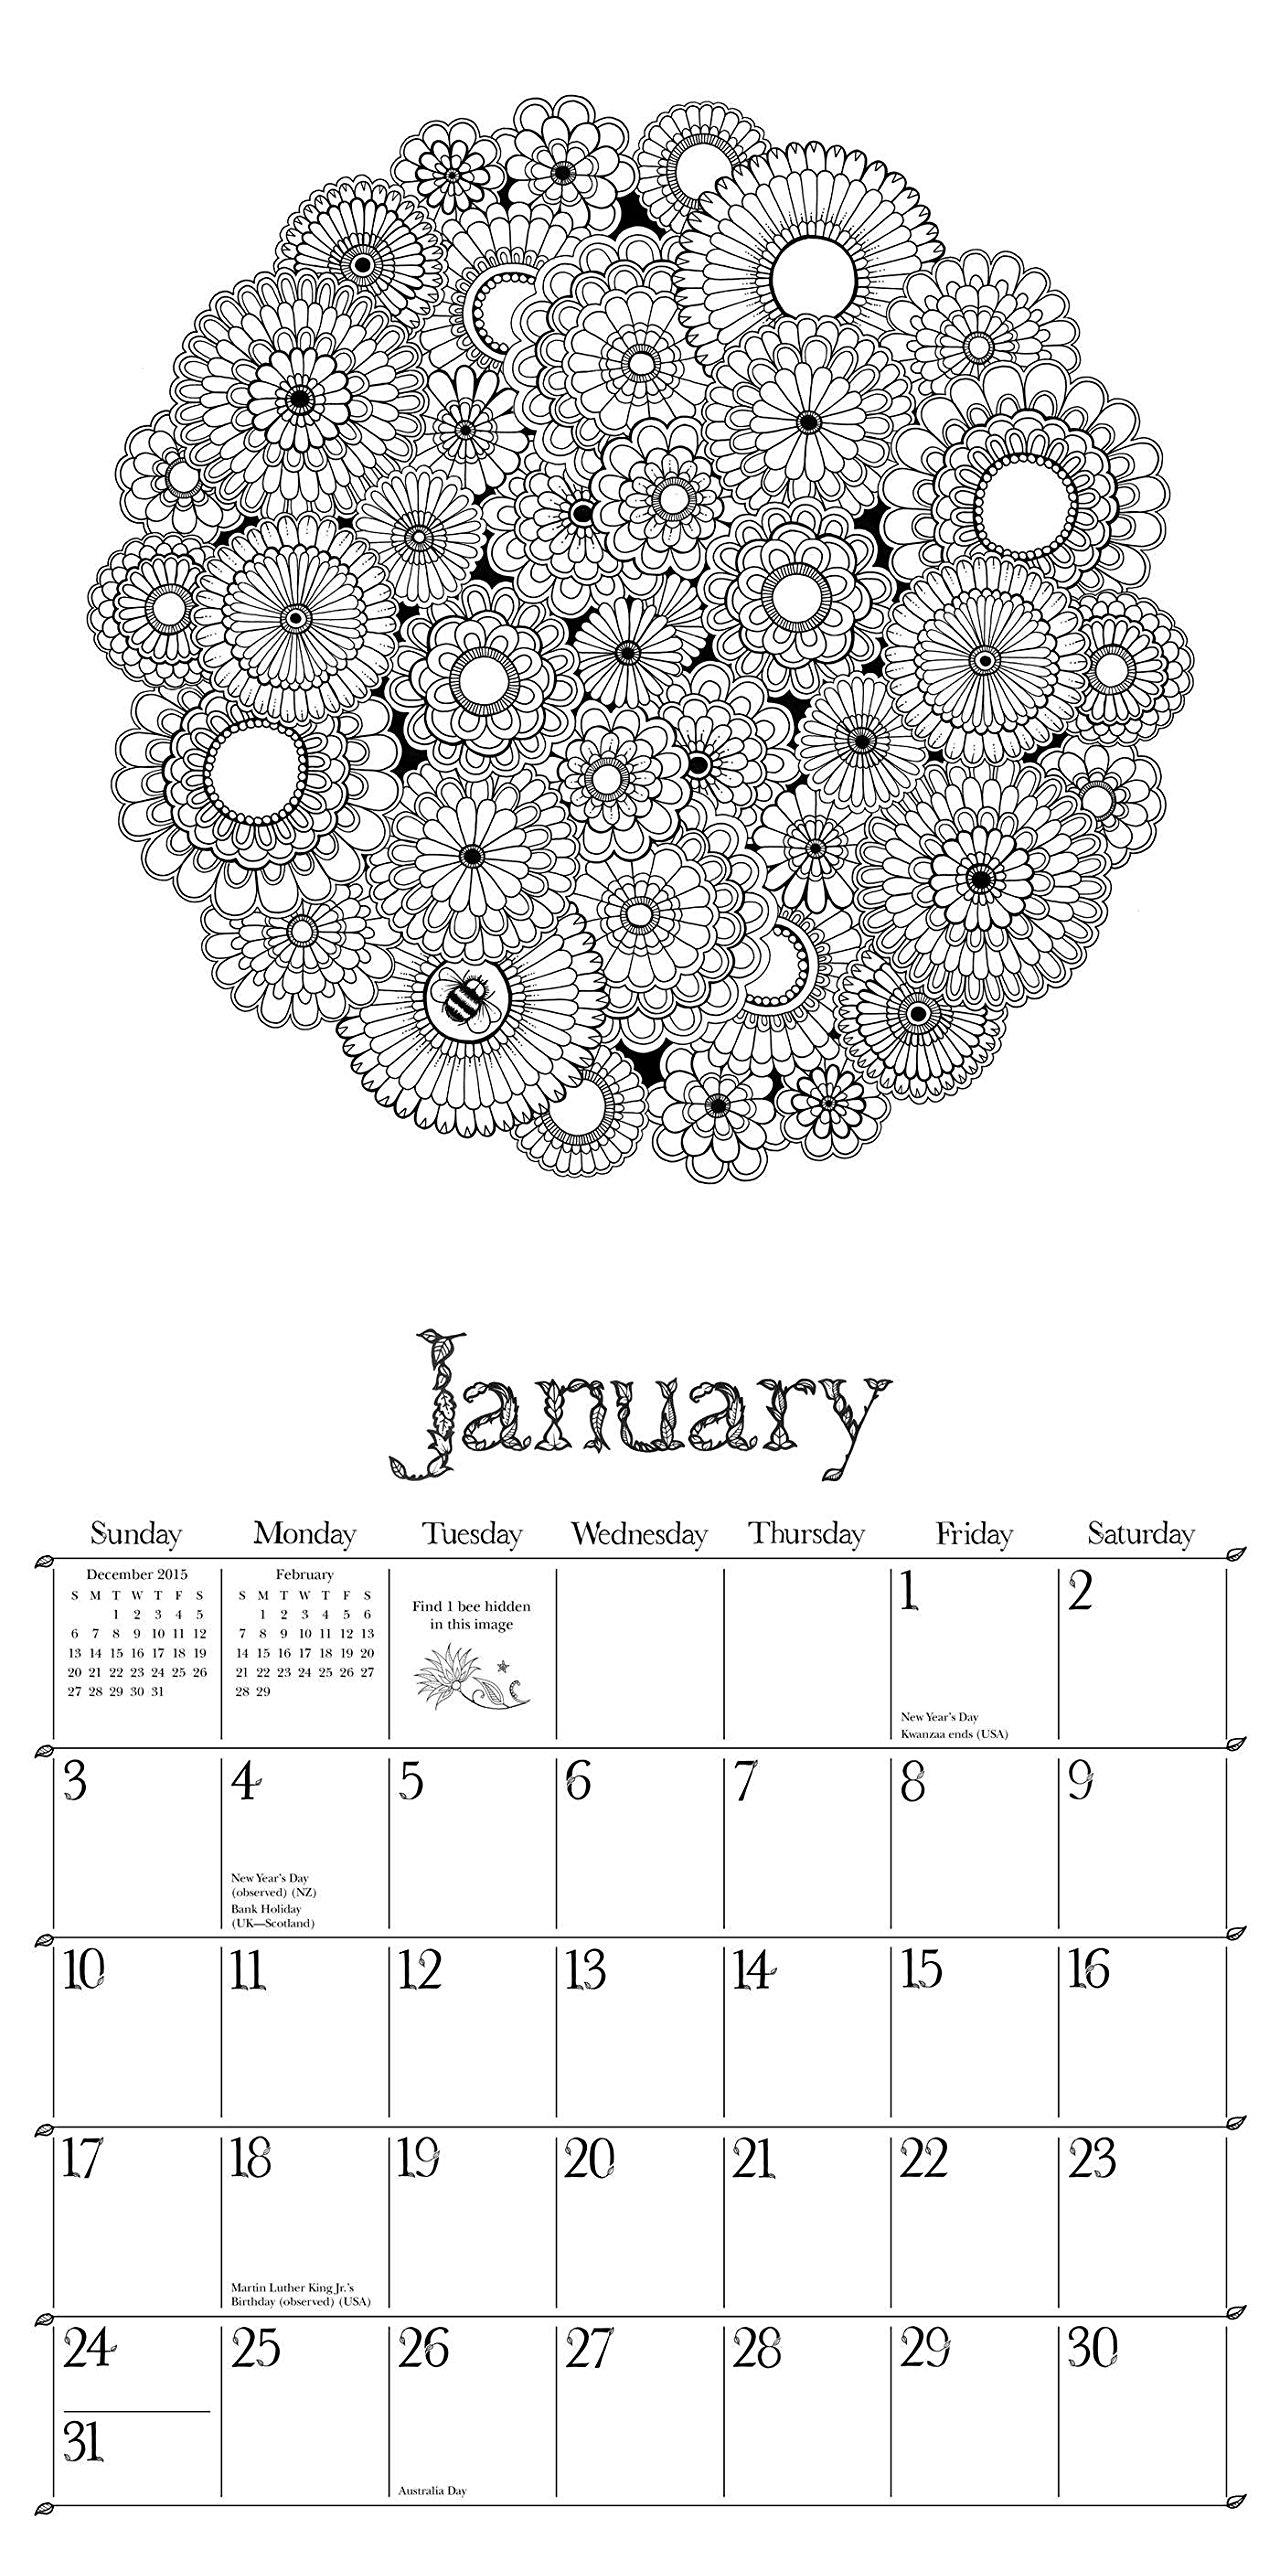 Secret Garden 2016 Wall Calendar: An Inky Treasure Hunt and ...